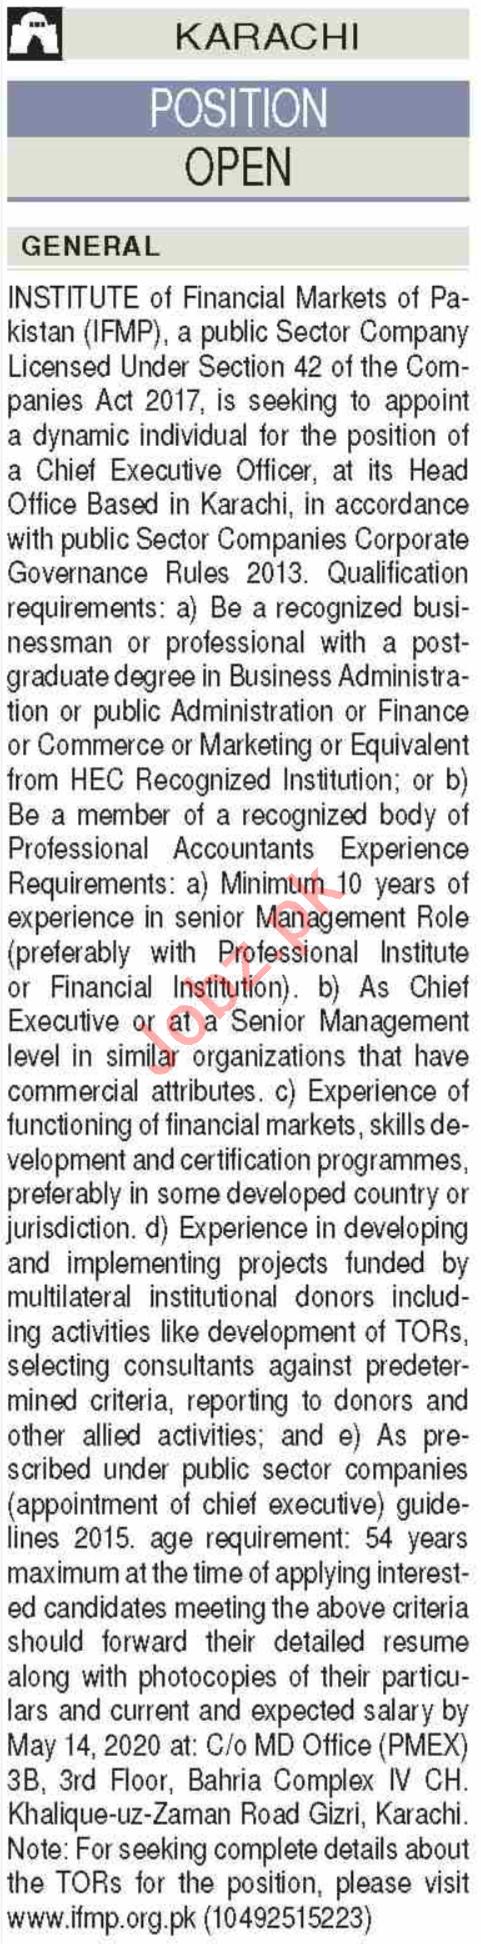 Institute of Financial Markets of Pakistan IFMP Jobs 2020